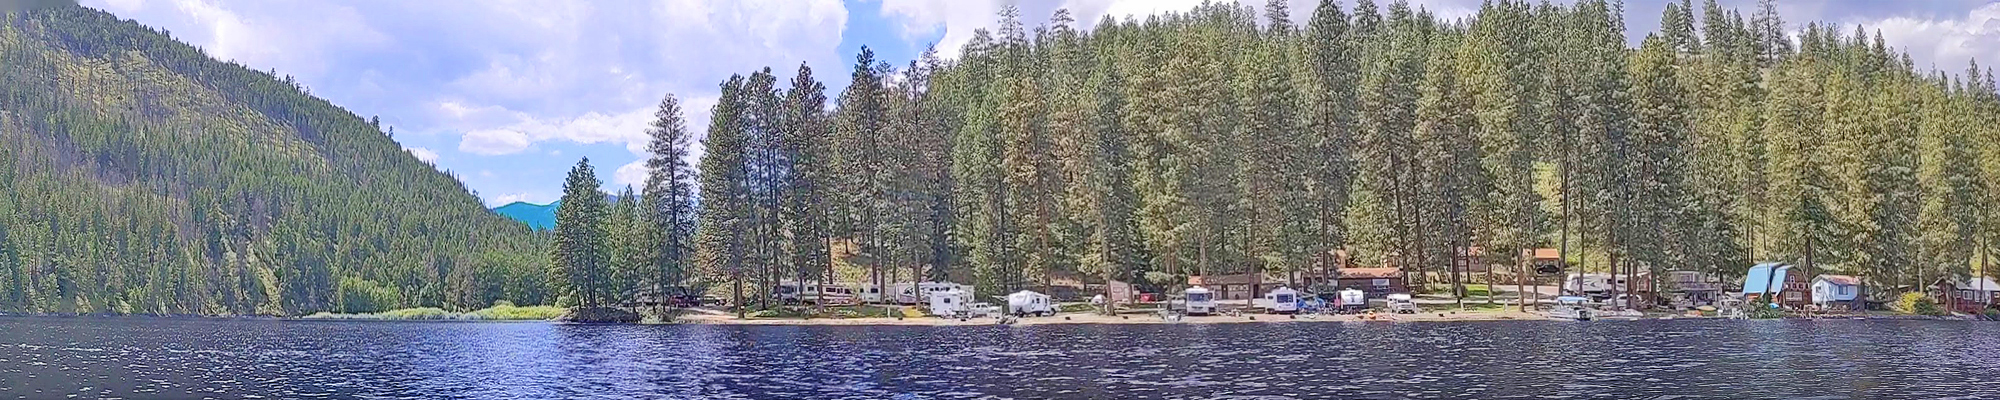 Shady Pines Resort